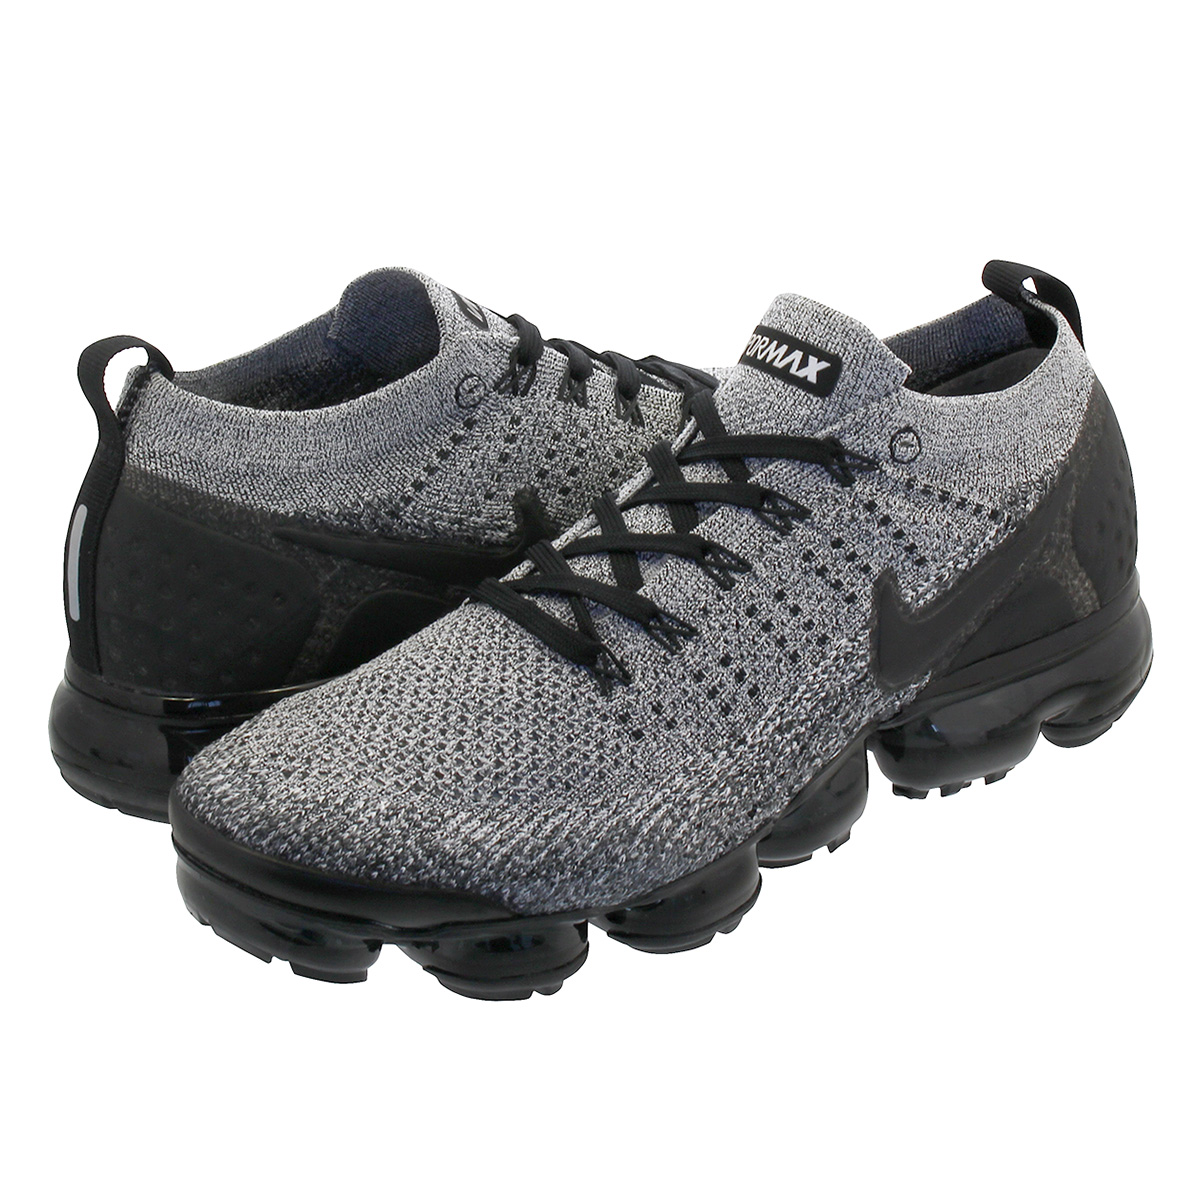 best website 68e77 dc884 NIKE AIR VAPORMAX FLYKNIT 2 Nike vapor max fried food knit 2  WHITE/BLACK/BLACK 942,842-107